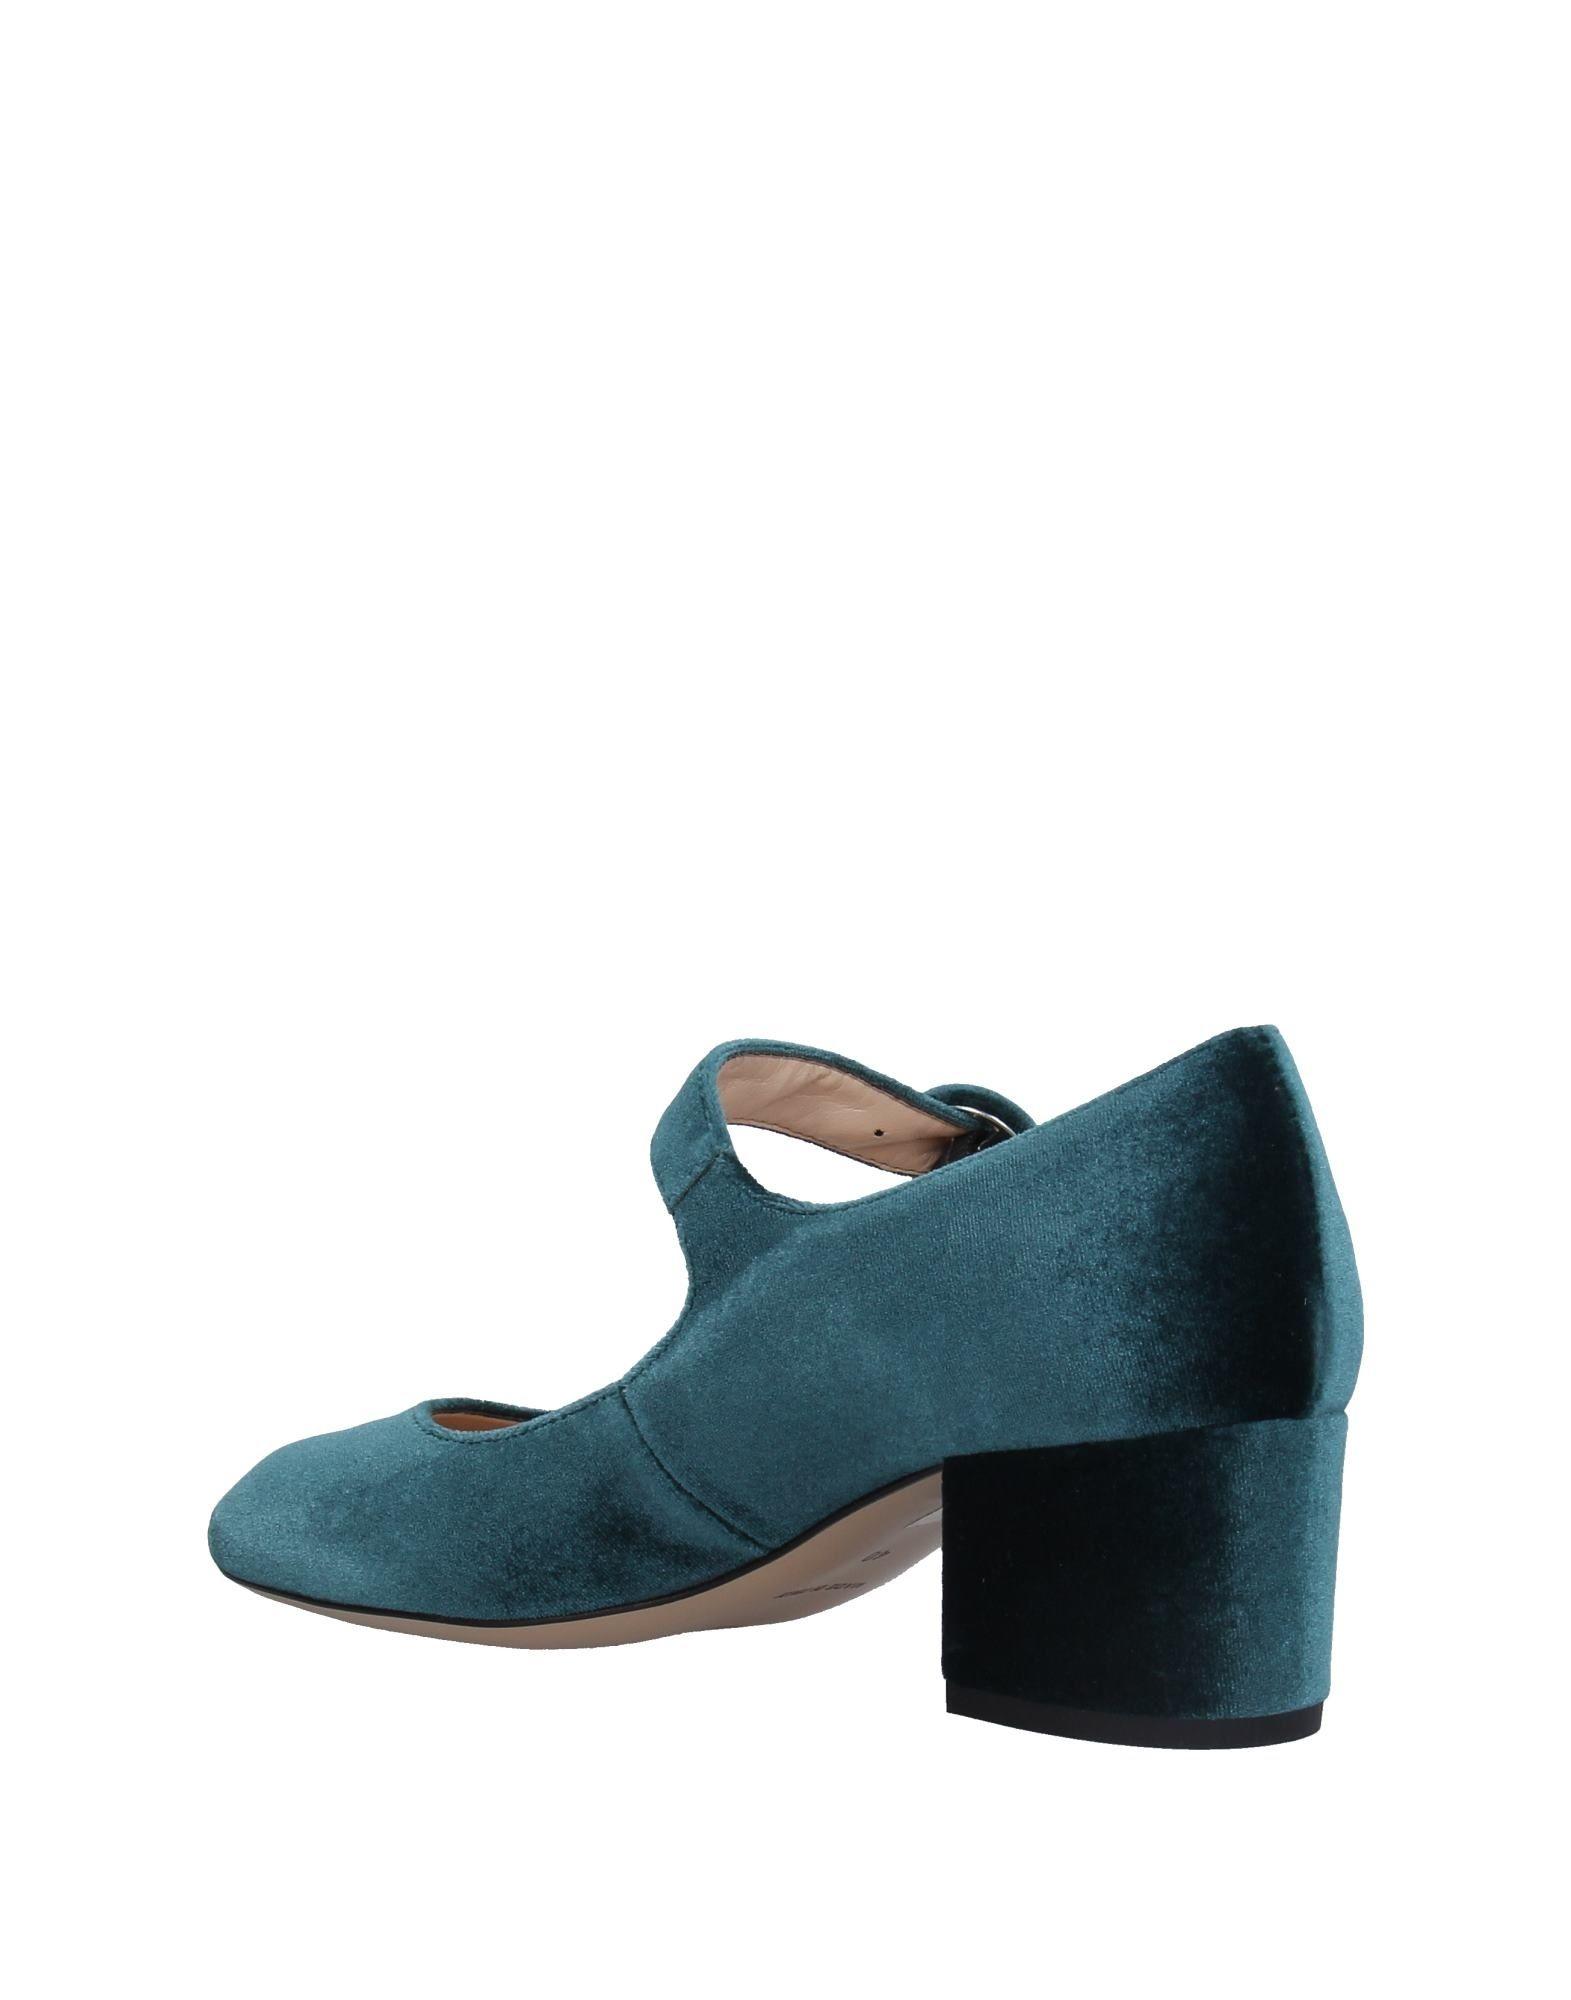 Gut um billige Schuhe zu  tragenChambre N°133 Pumps Damen  zu 11264729EJ 9df0fd